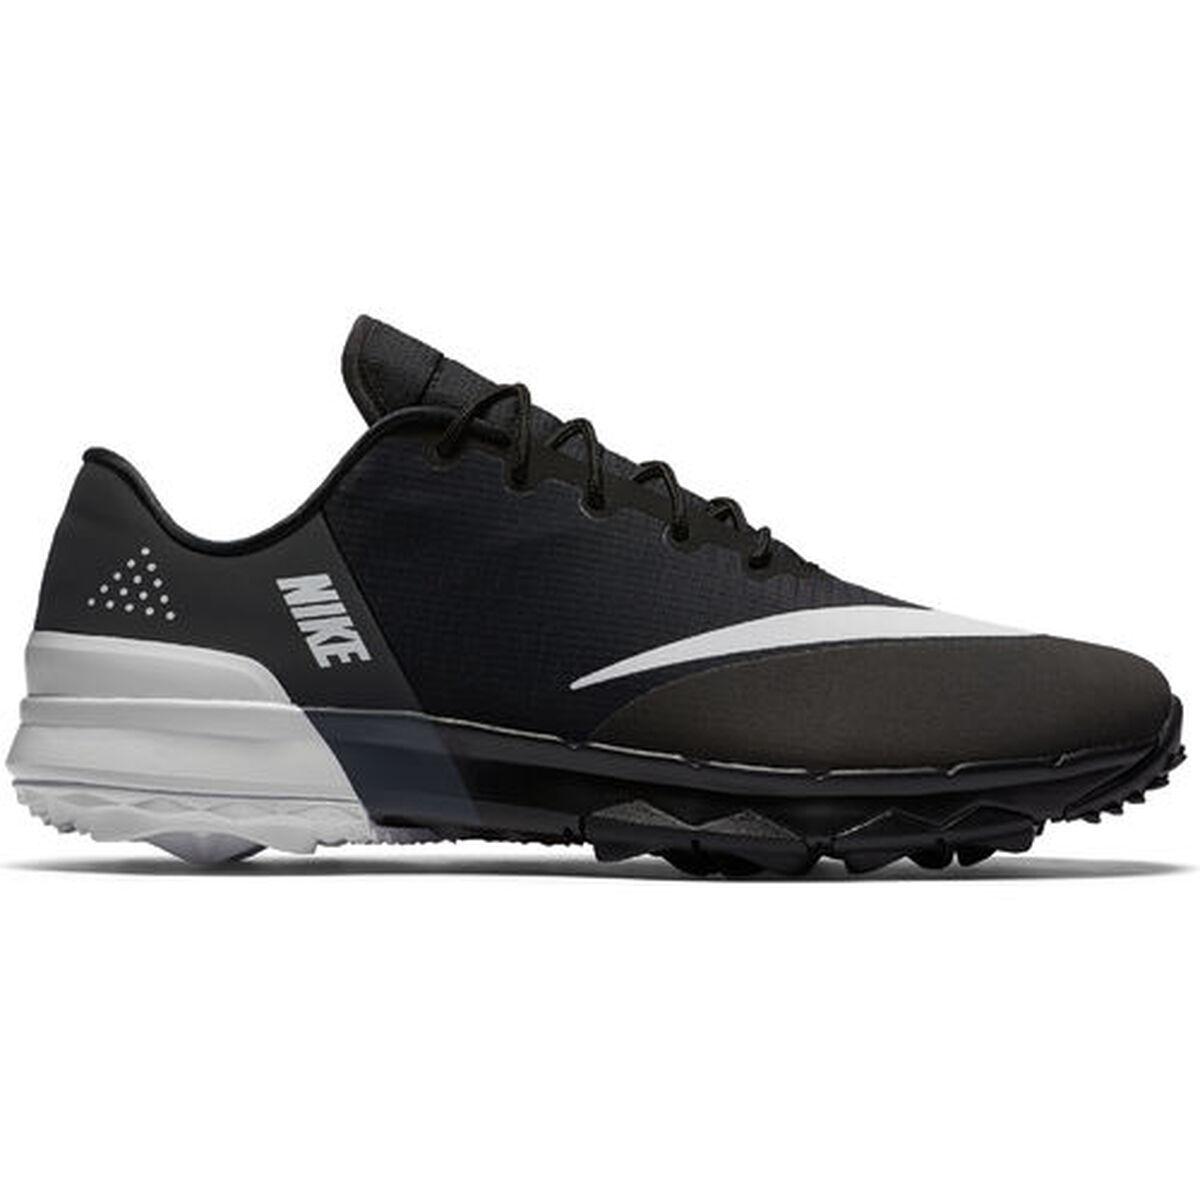 a452b13b87dd Images. Nike FI Flex Men  39 s Golf Shoe ...